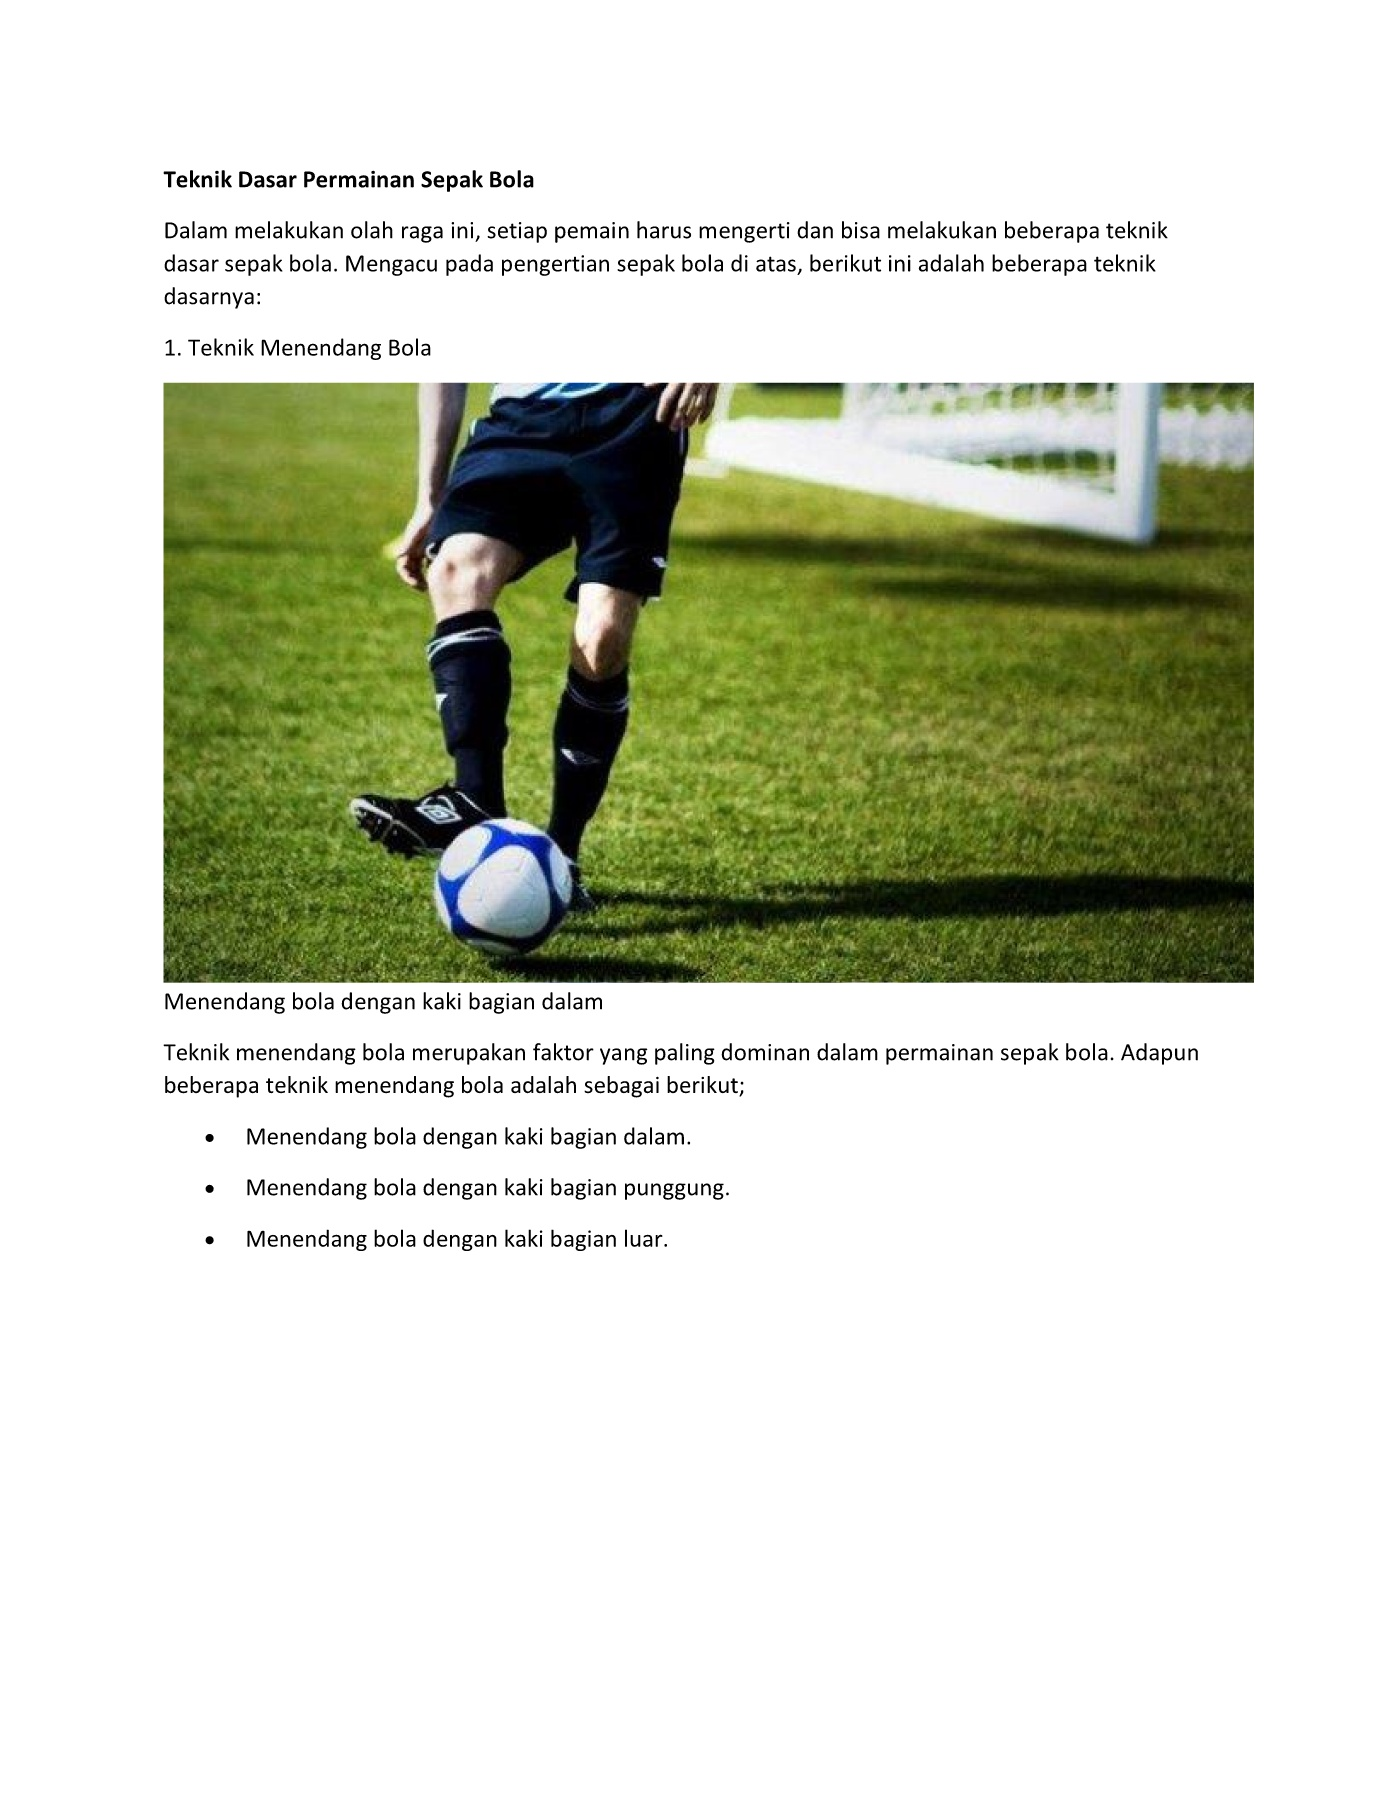 Pengertian Menendang Bola : pengertian, menendang, Sepak